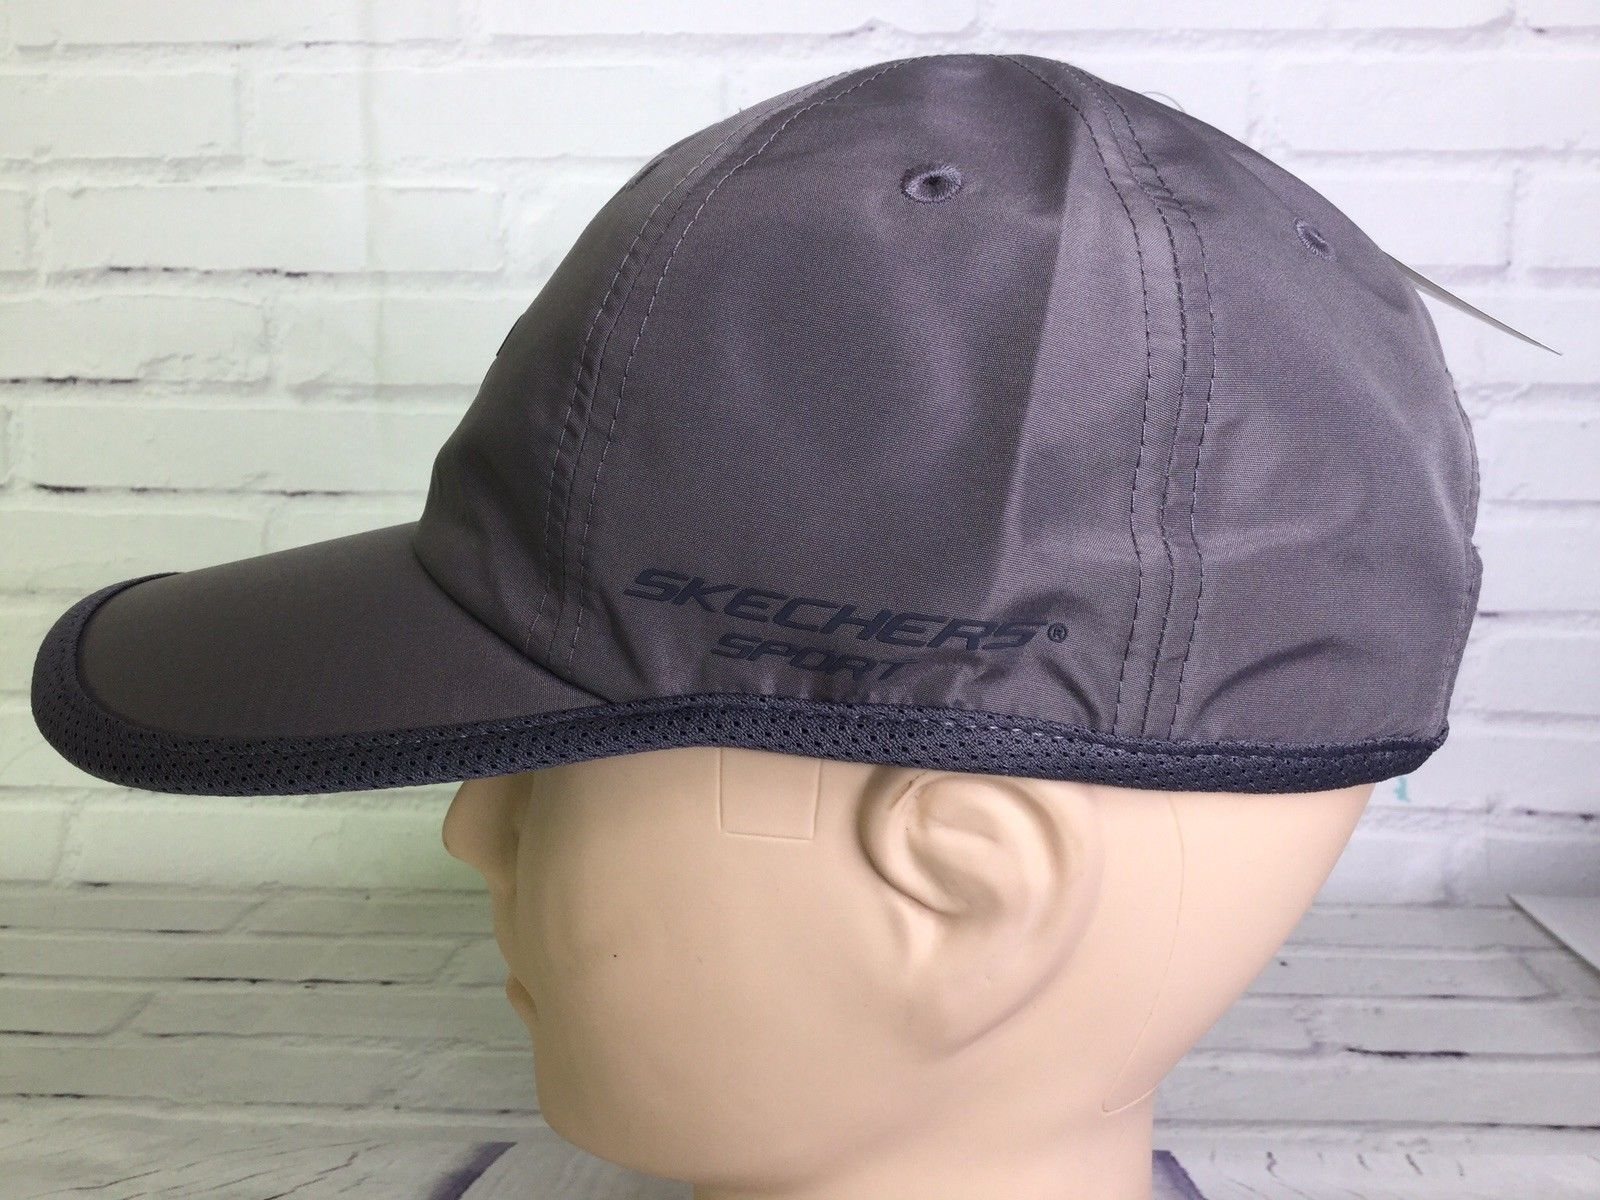 Skechers Sport Hat Cap Gray Strapback Logo Lightweight One Size Fits All